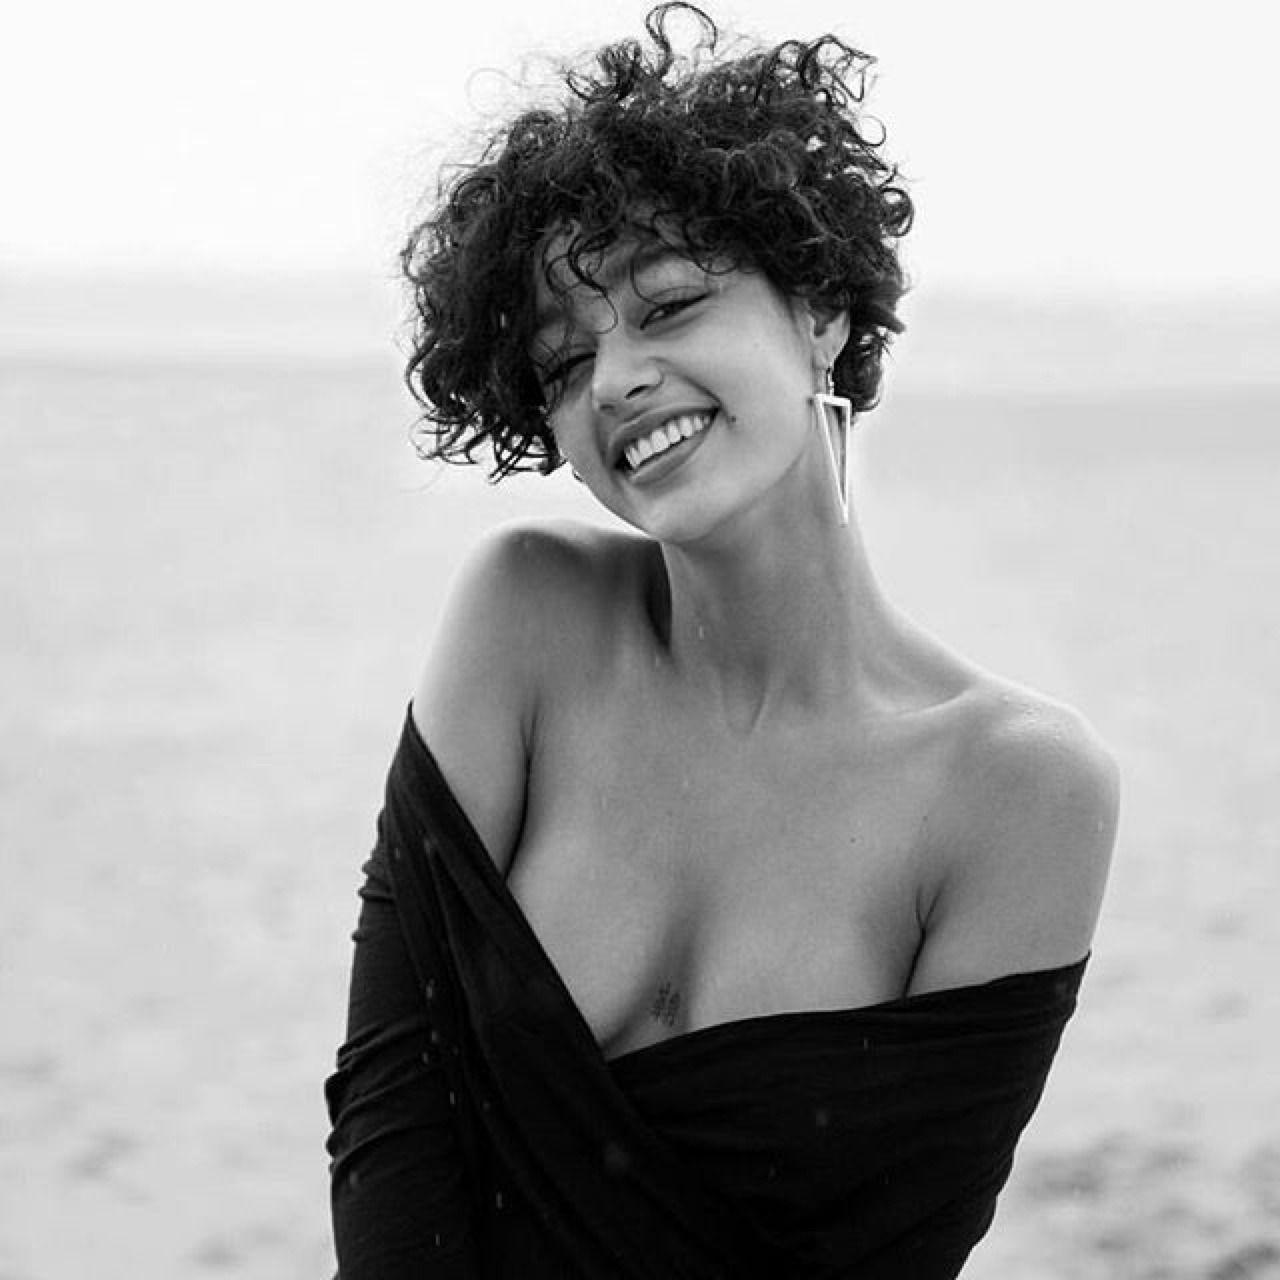 Bikini Damaris Goddrie nudes (57 photos), Pussy, Fappening, Feet, braless 2018